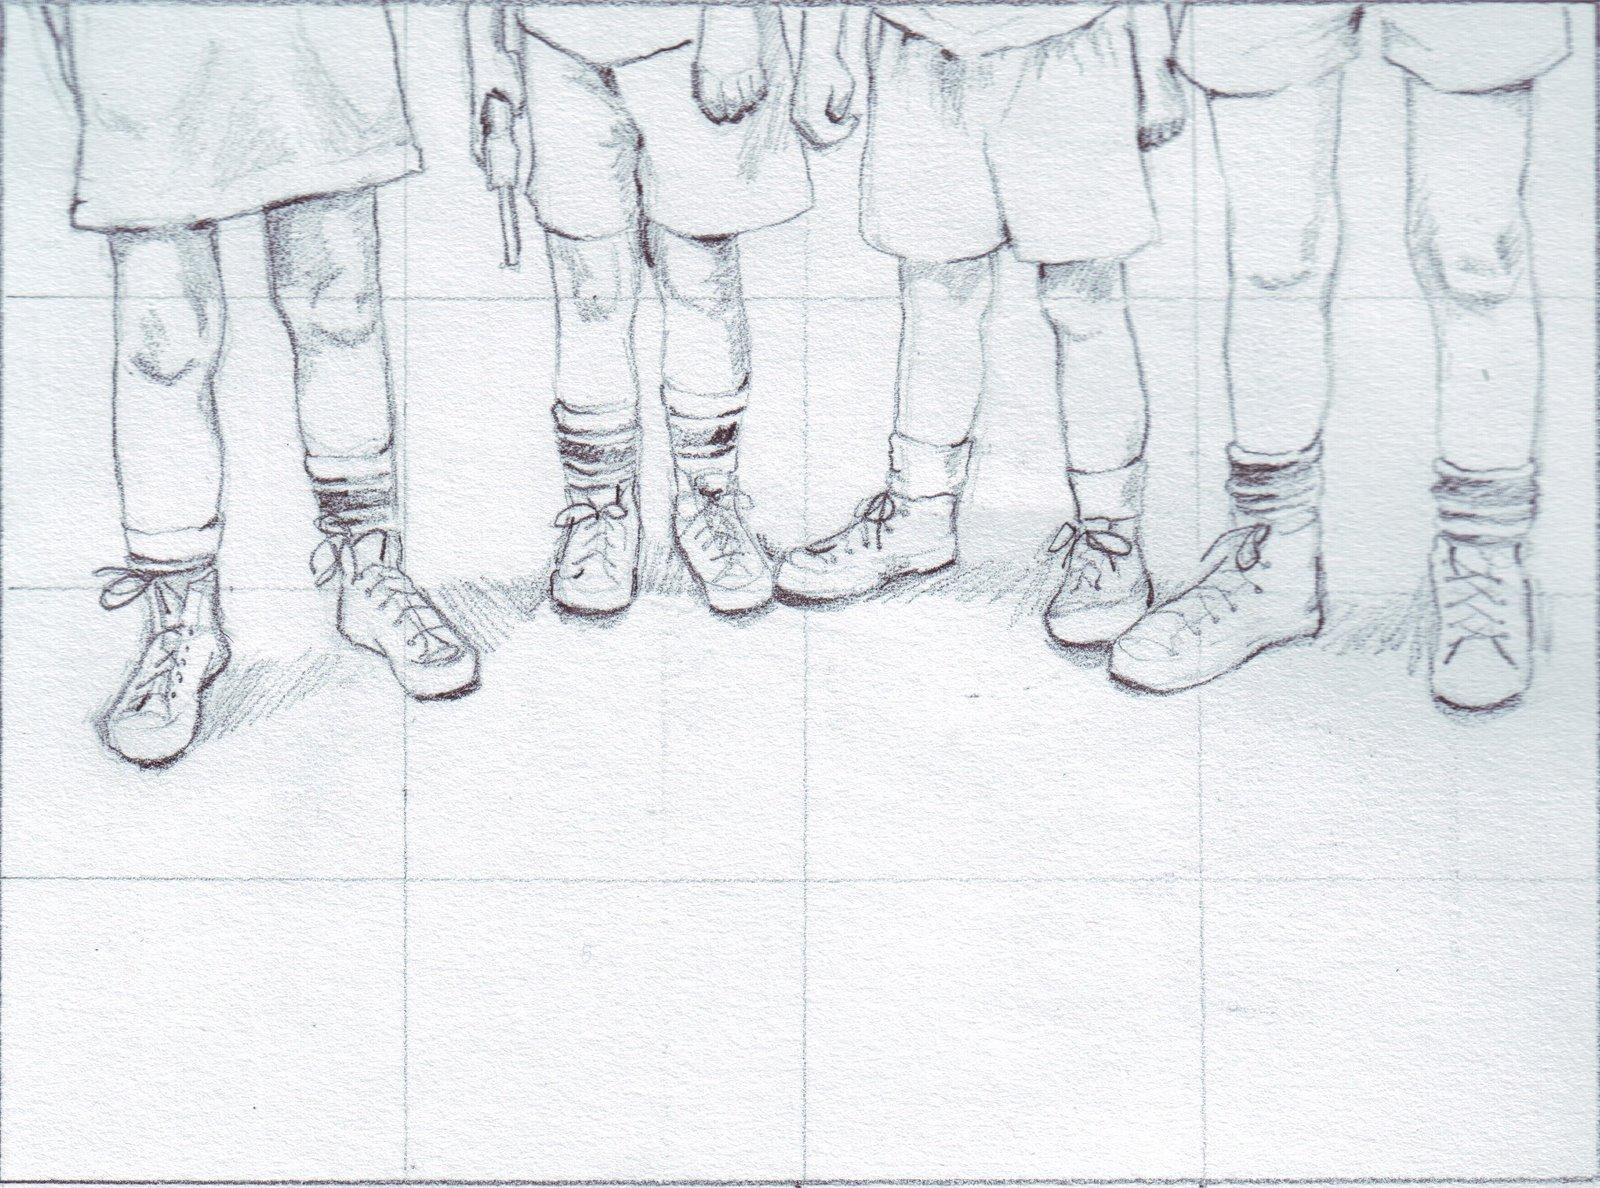 [greenshoes]